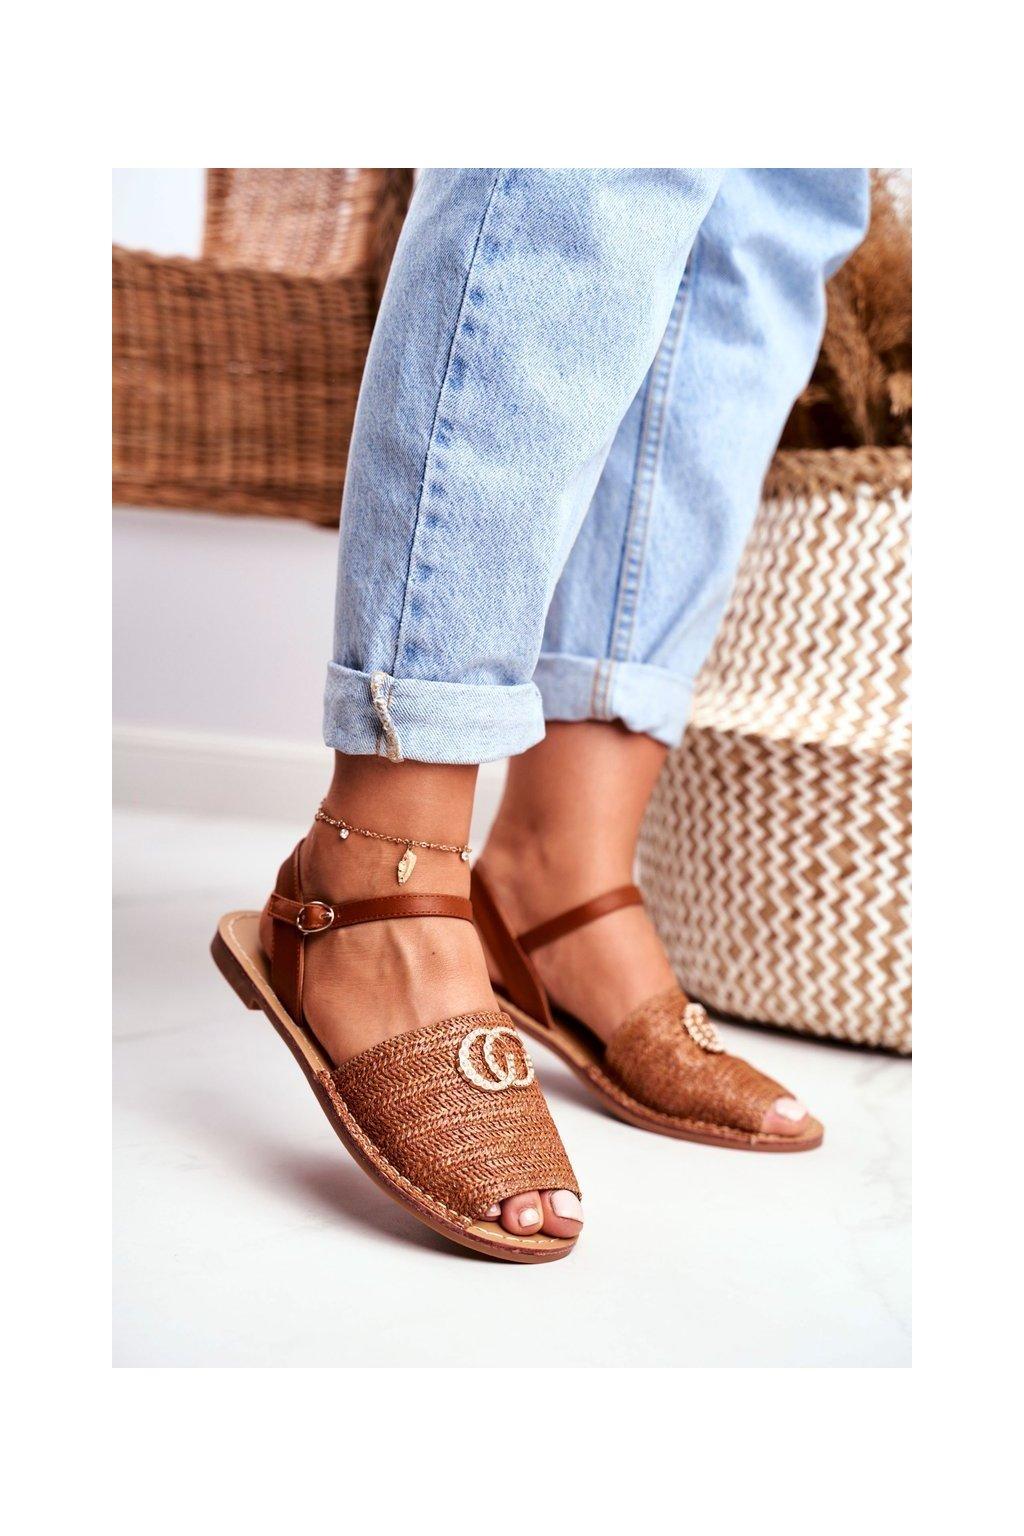 Dámske ploché sandále farba hnedá NJSK 108-B8 CAMEL